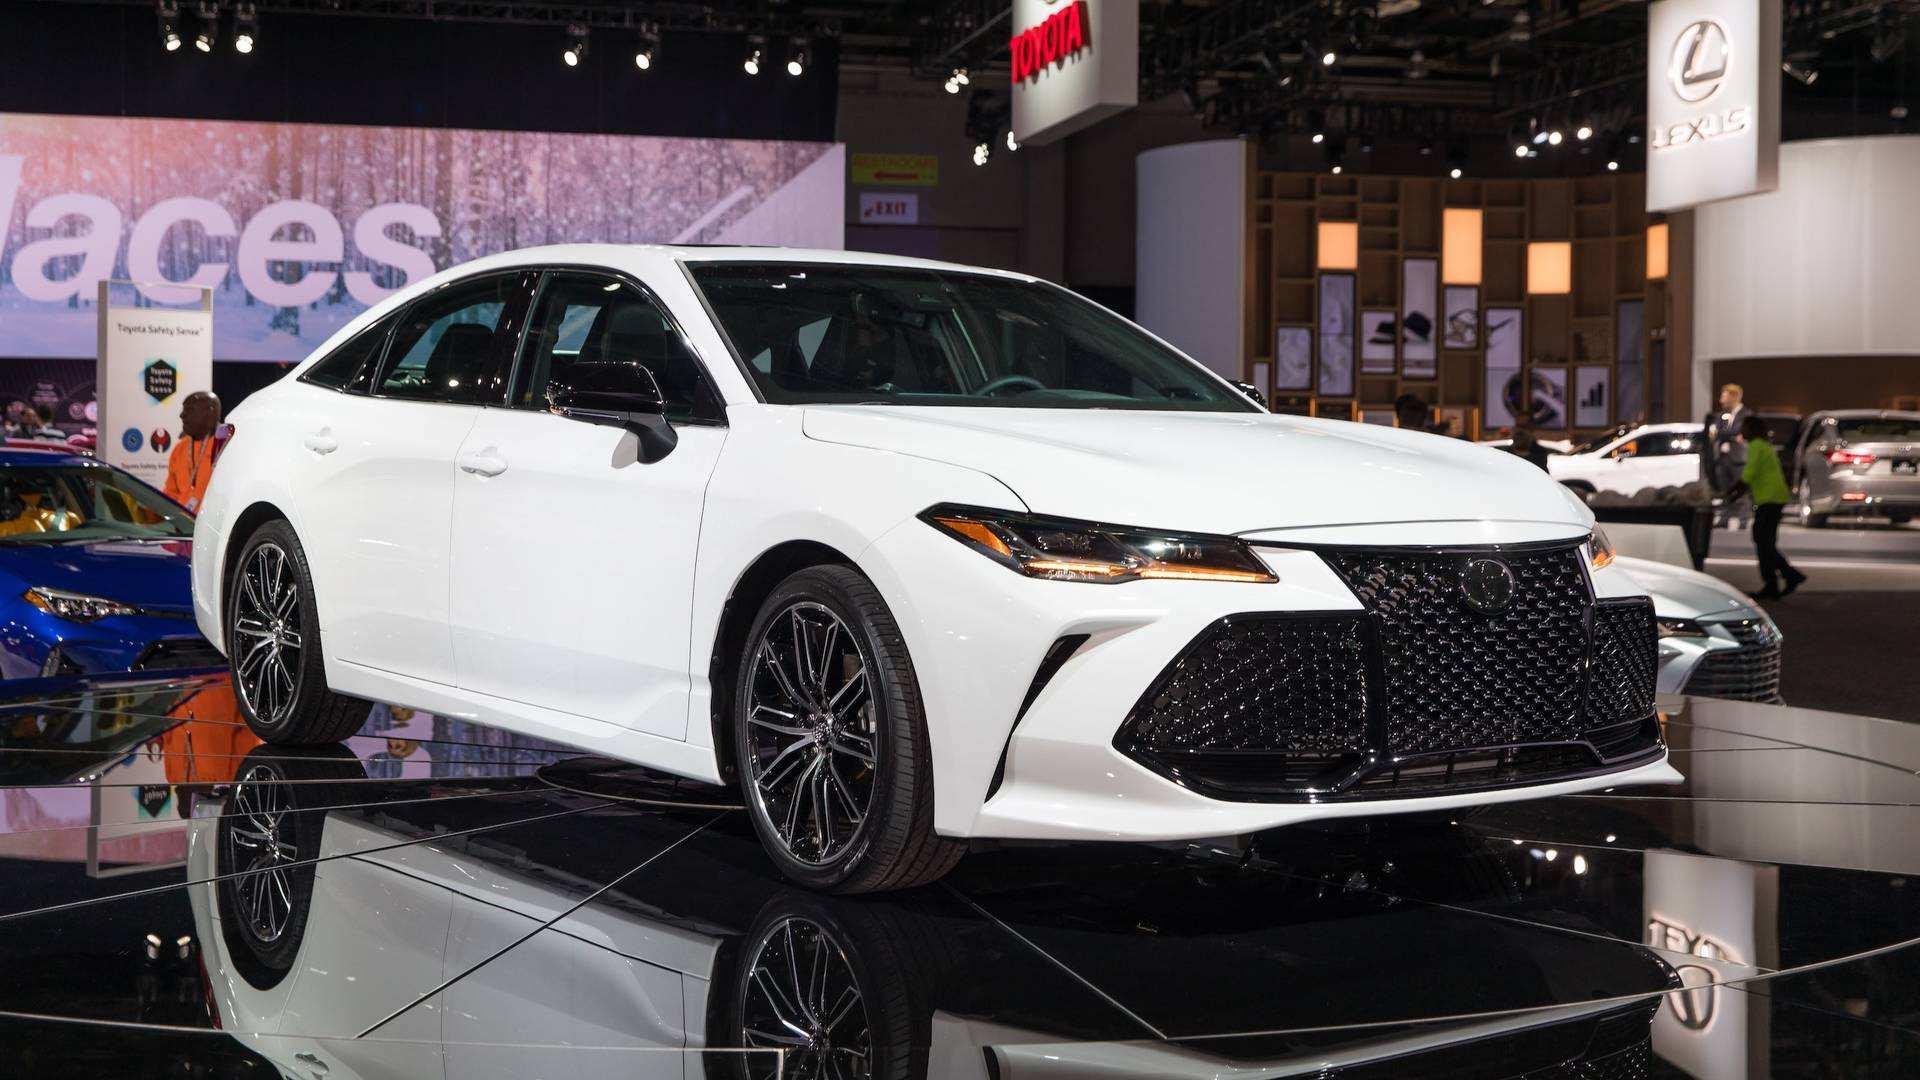 17 Best Review New Lexus Vs Avalon 2019 Performance Pricing for New Lexus Vs Avalon 2019 Performance